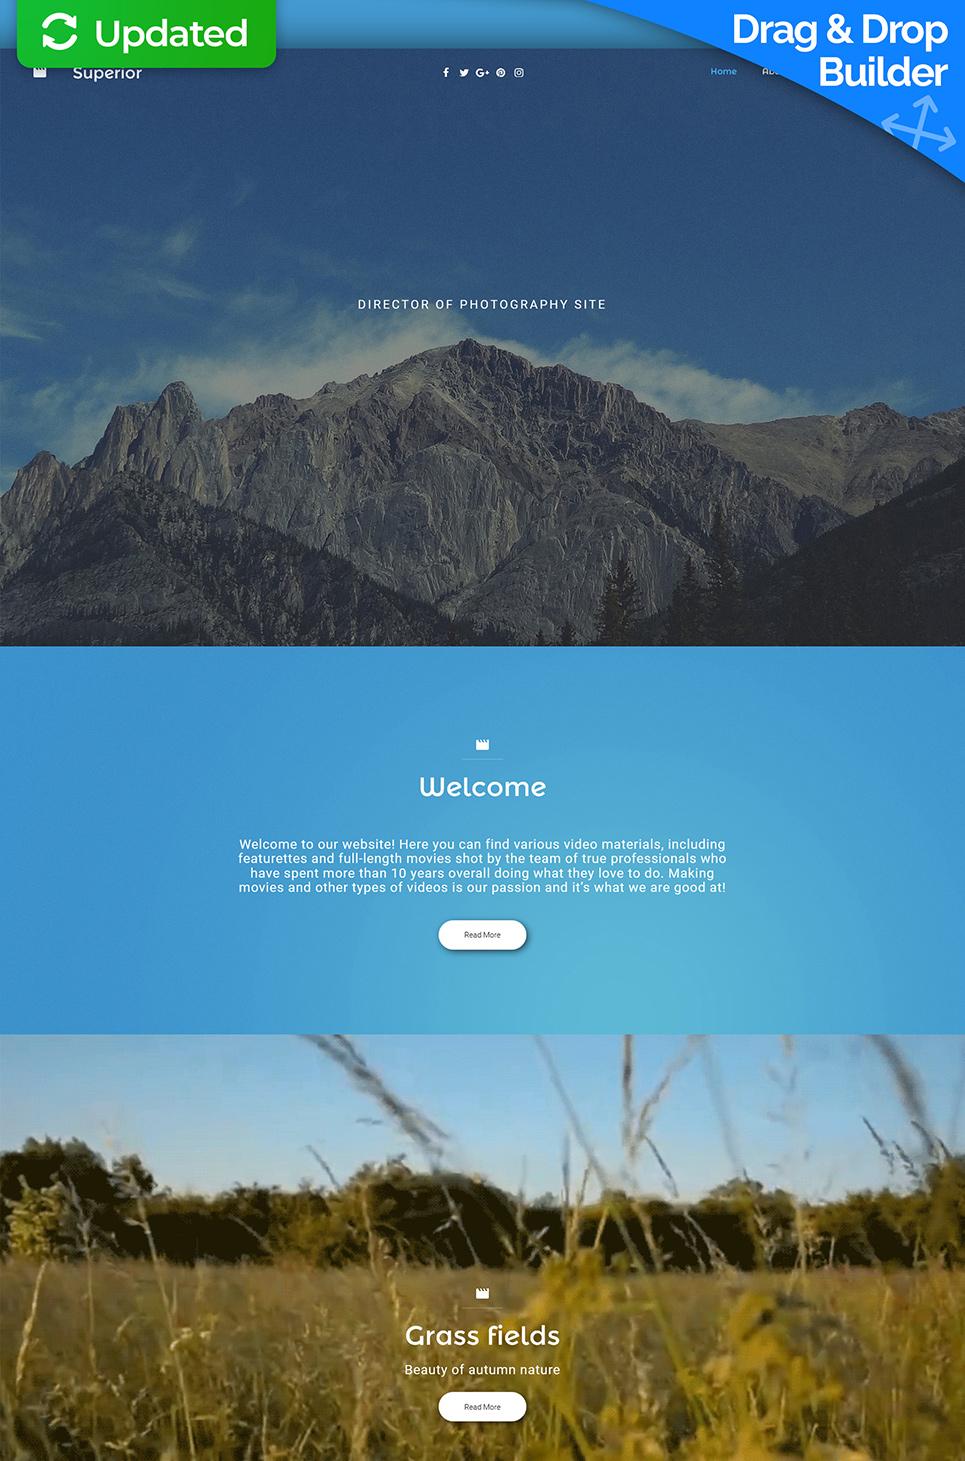 Superior Responsive Website Template - image